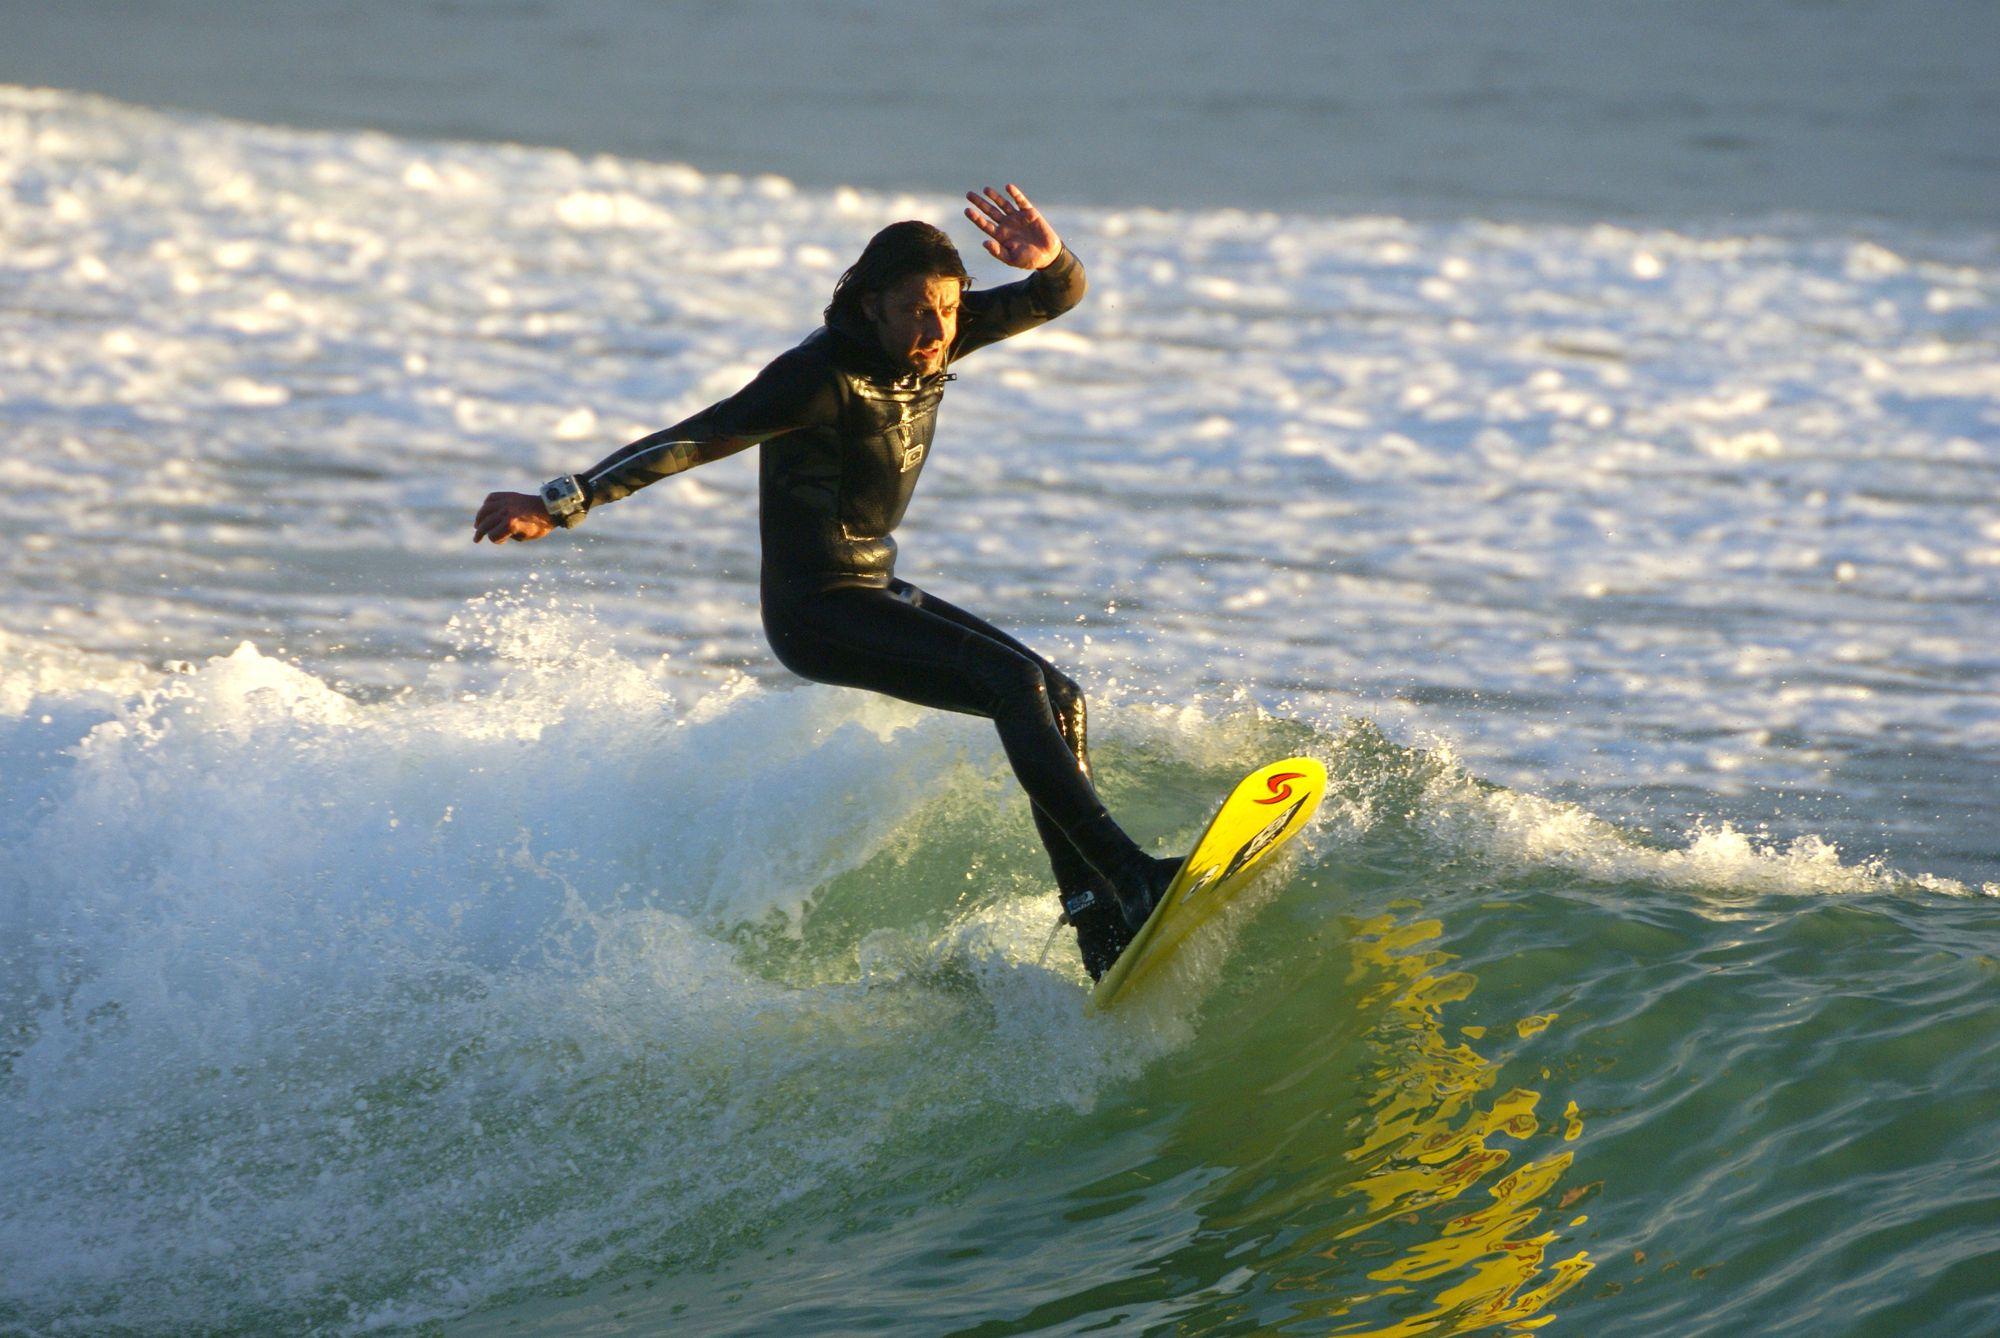 Surfing at Whitesands